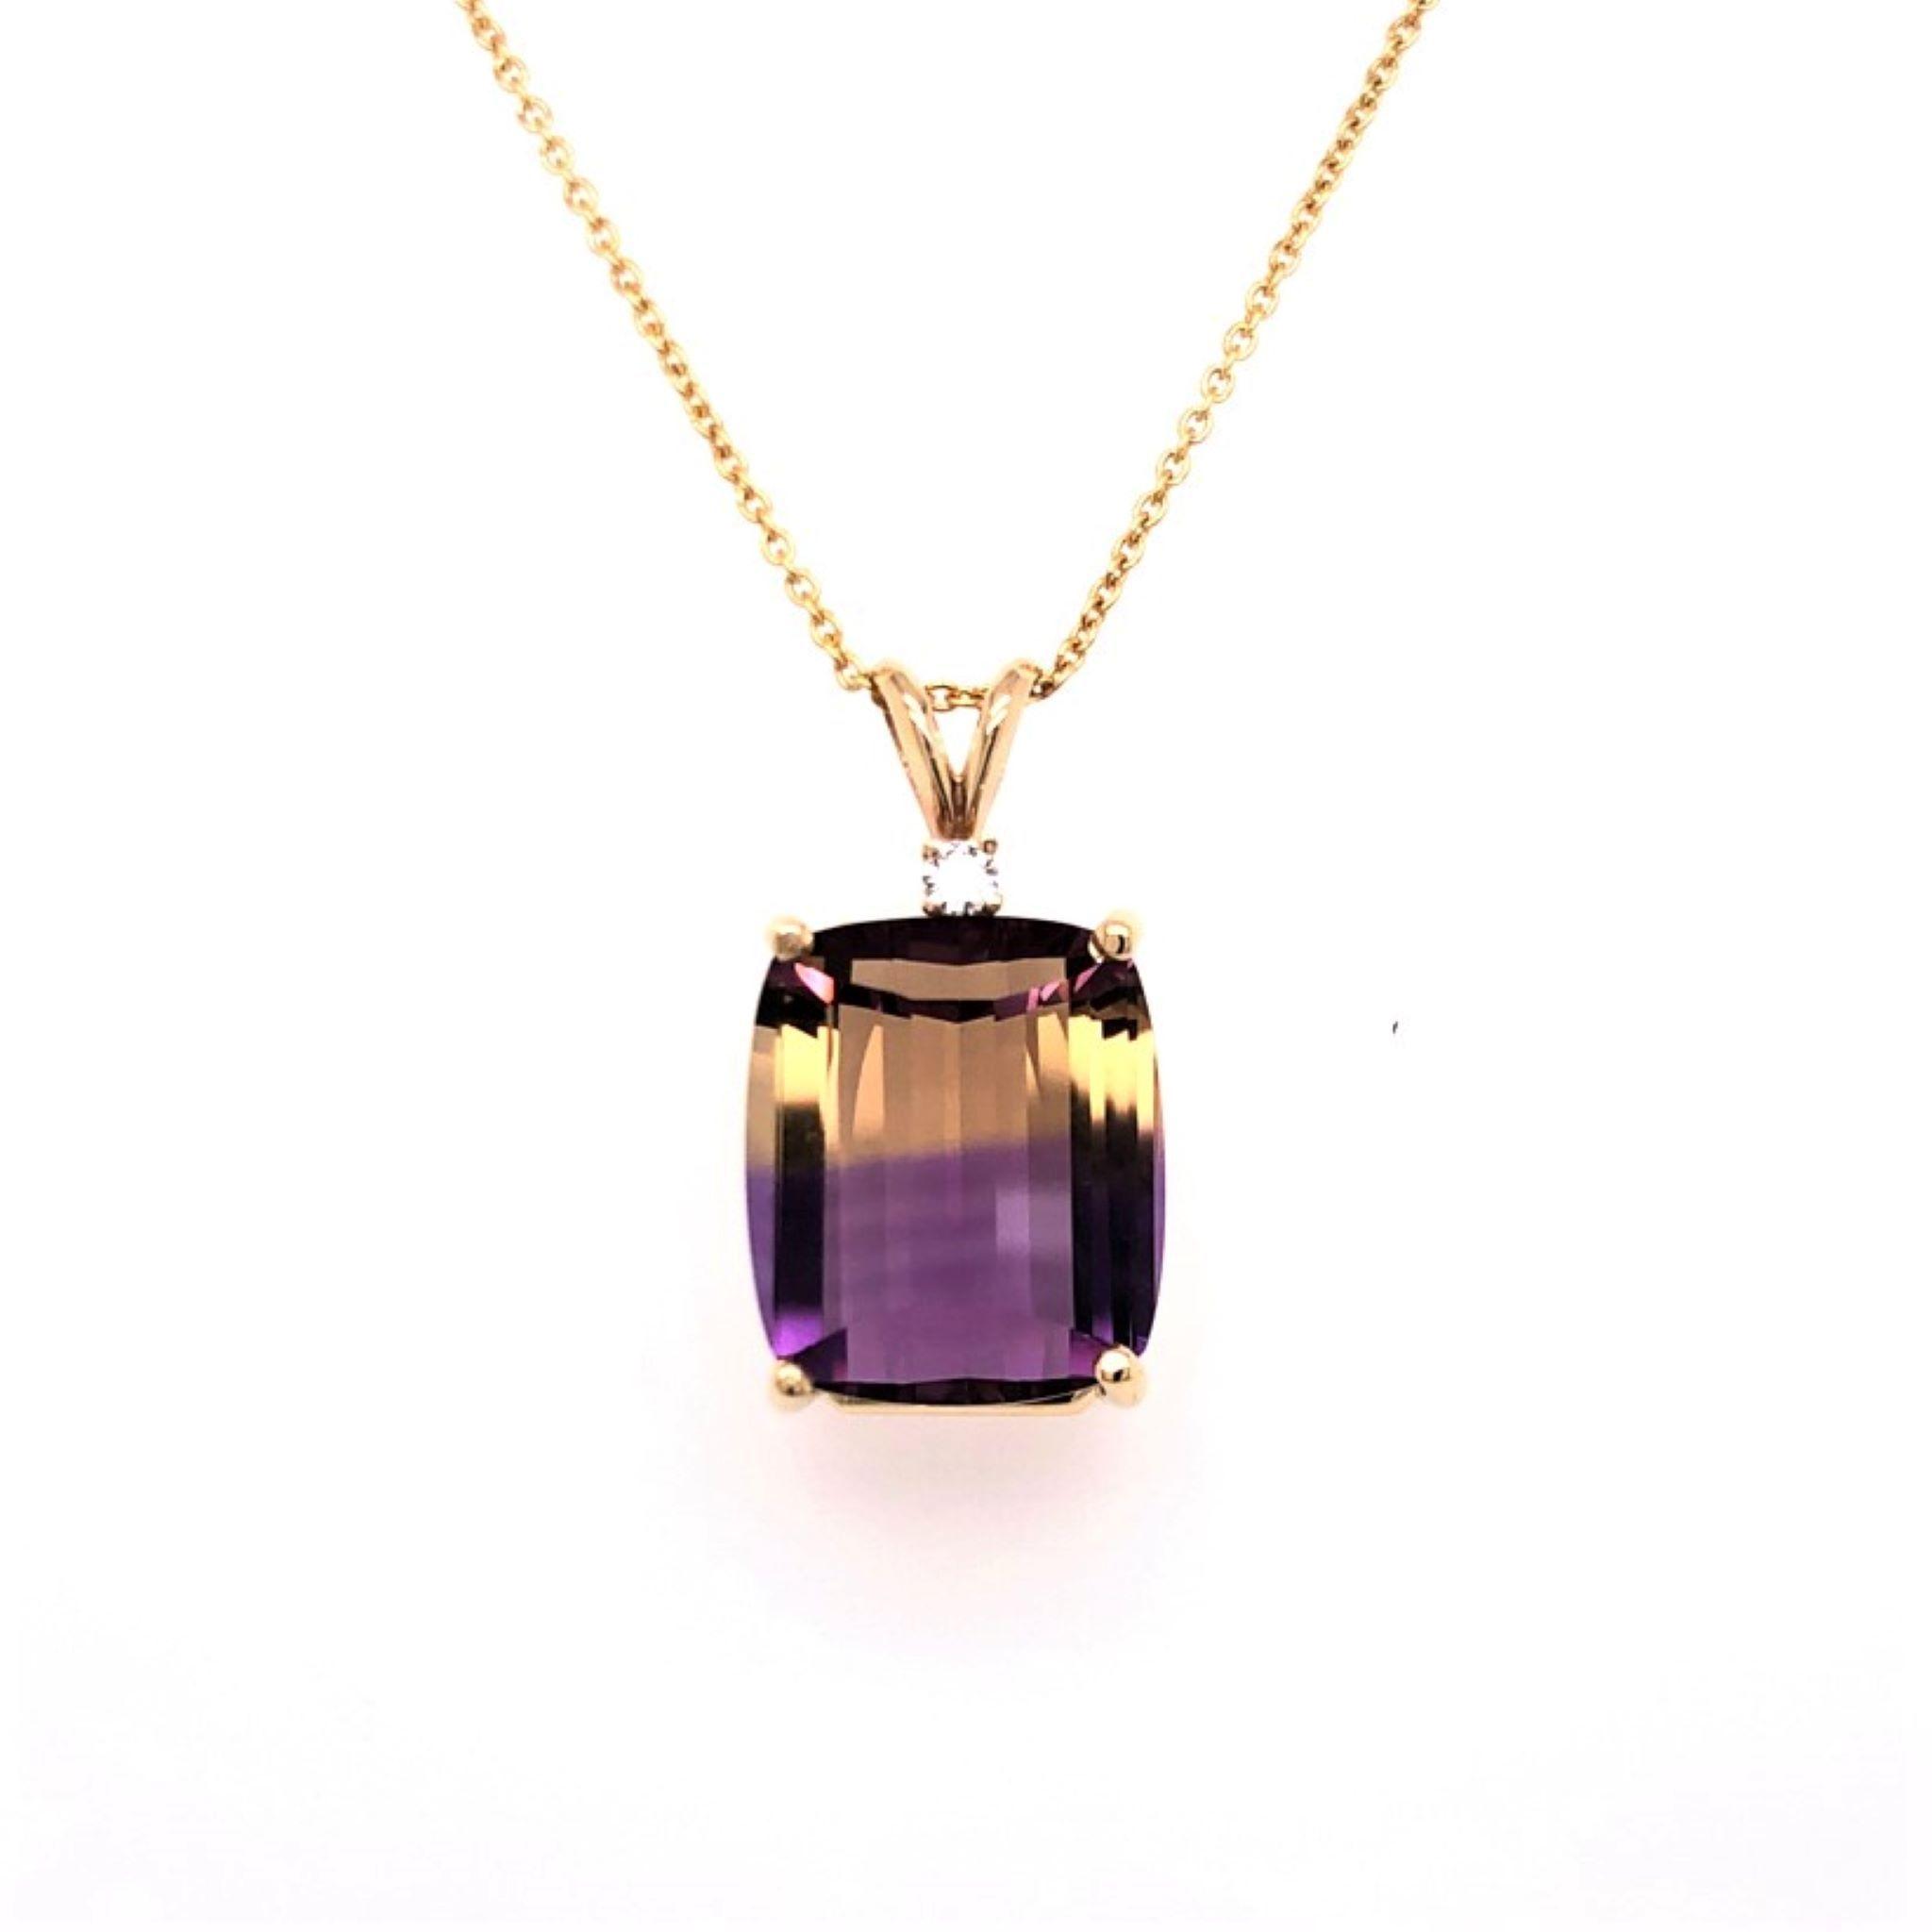 Cushion Shaped Ametrine Pendant - Davalle Jewelers